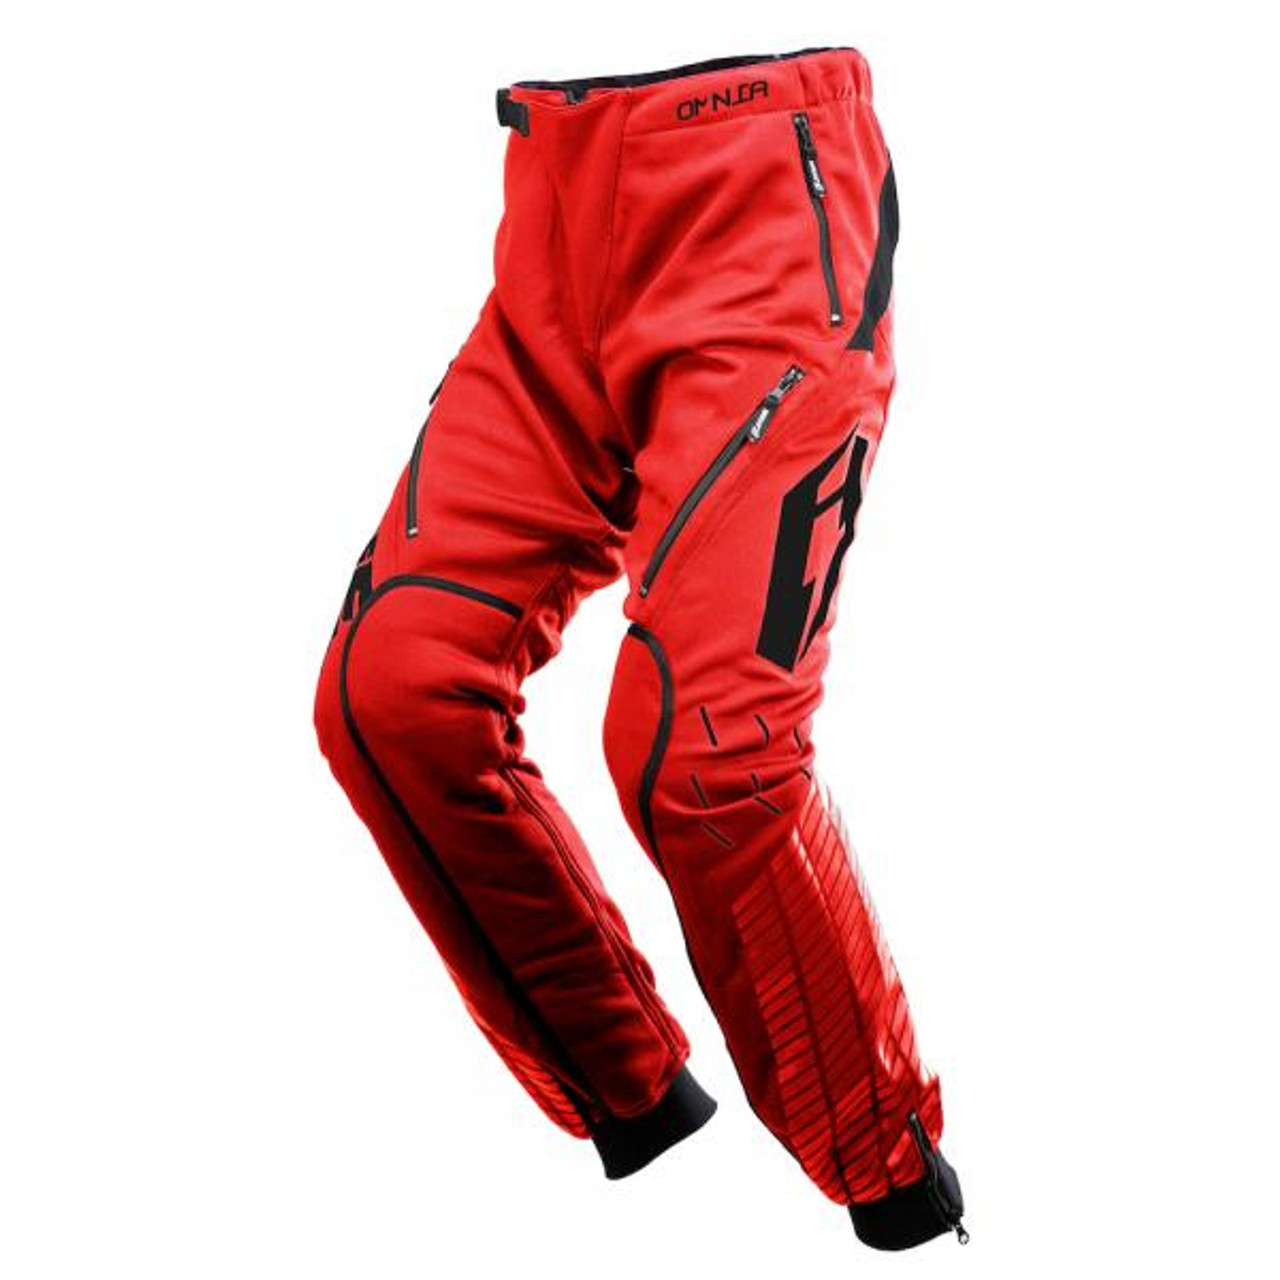 Pants 01 Omnia Solid, red/black